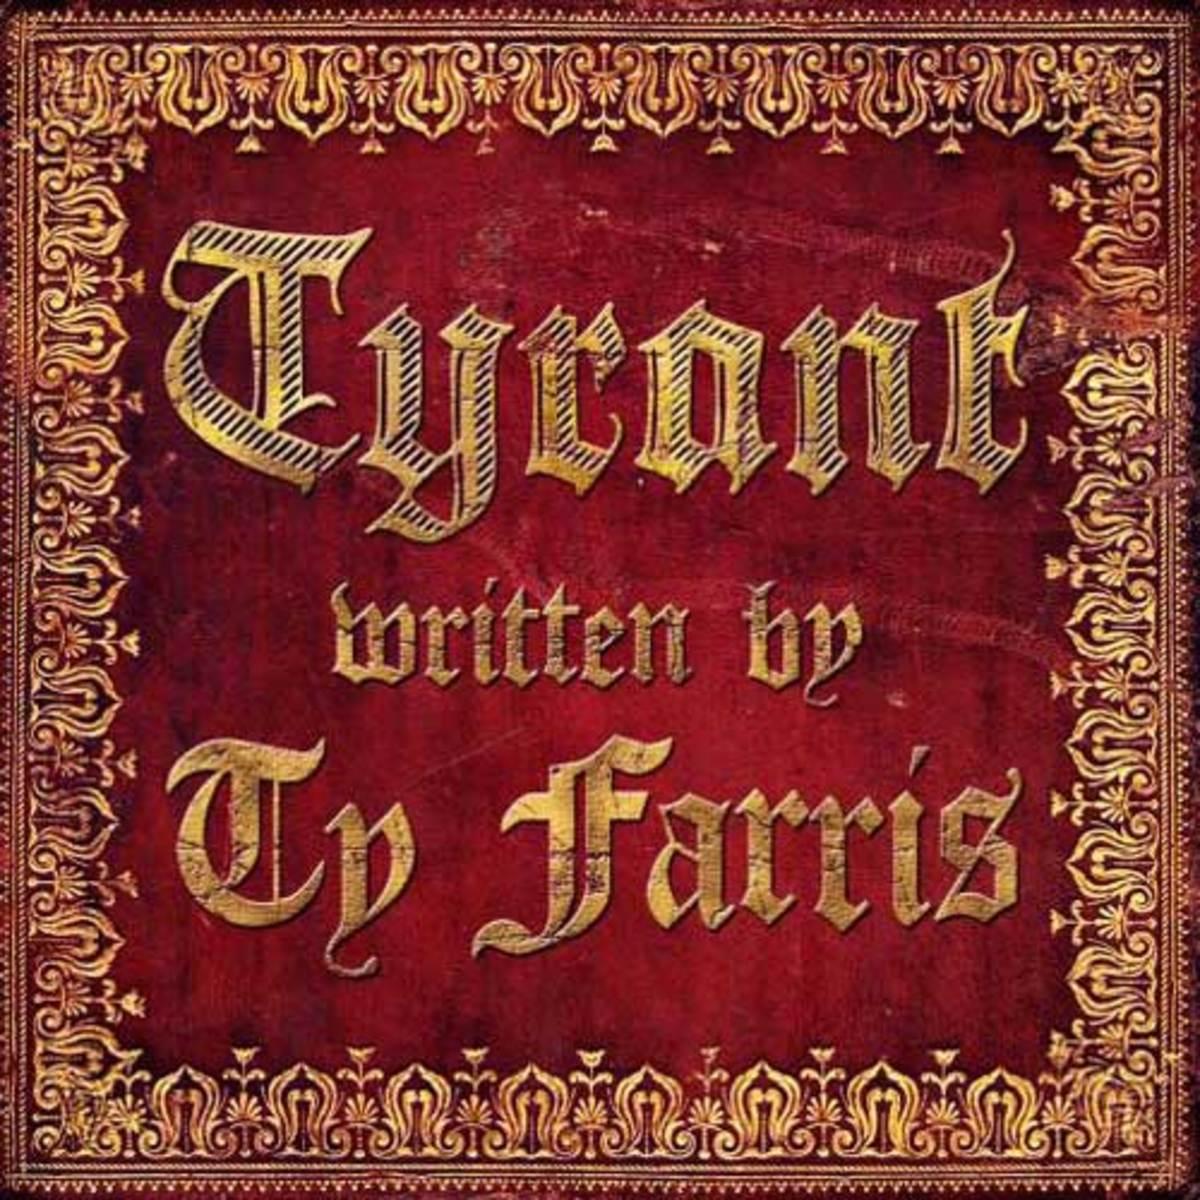 tyfarris-tyrant.jpg